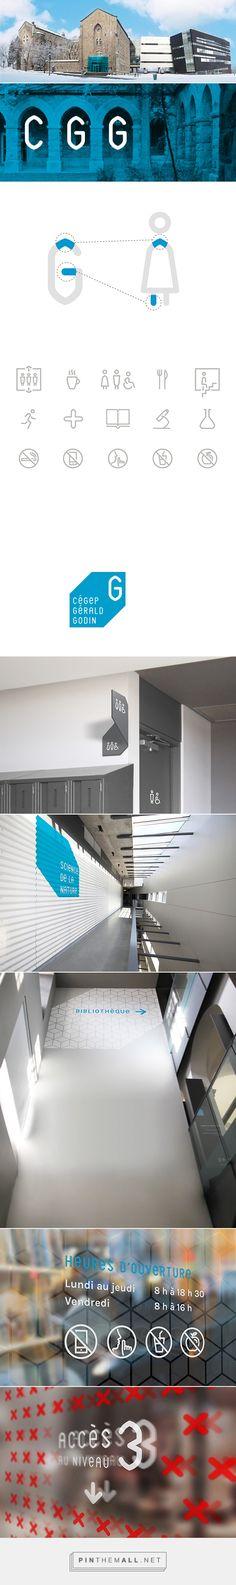 Cégep Gérald-Godin — Signage & Wayfinding System on Behance Bélanger Branding Design Ltée. Creative direction & Wayfinding strategy : Ali Syed Art direction & Graphic design : Anaïs Garençon